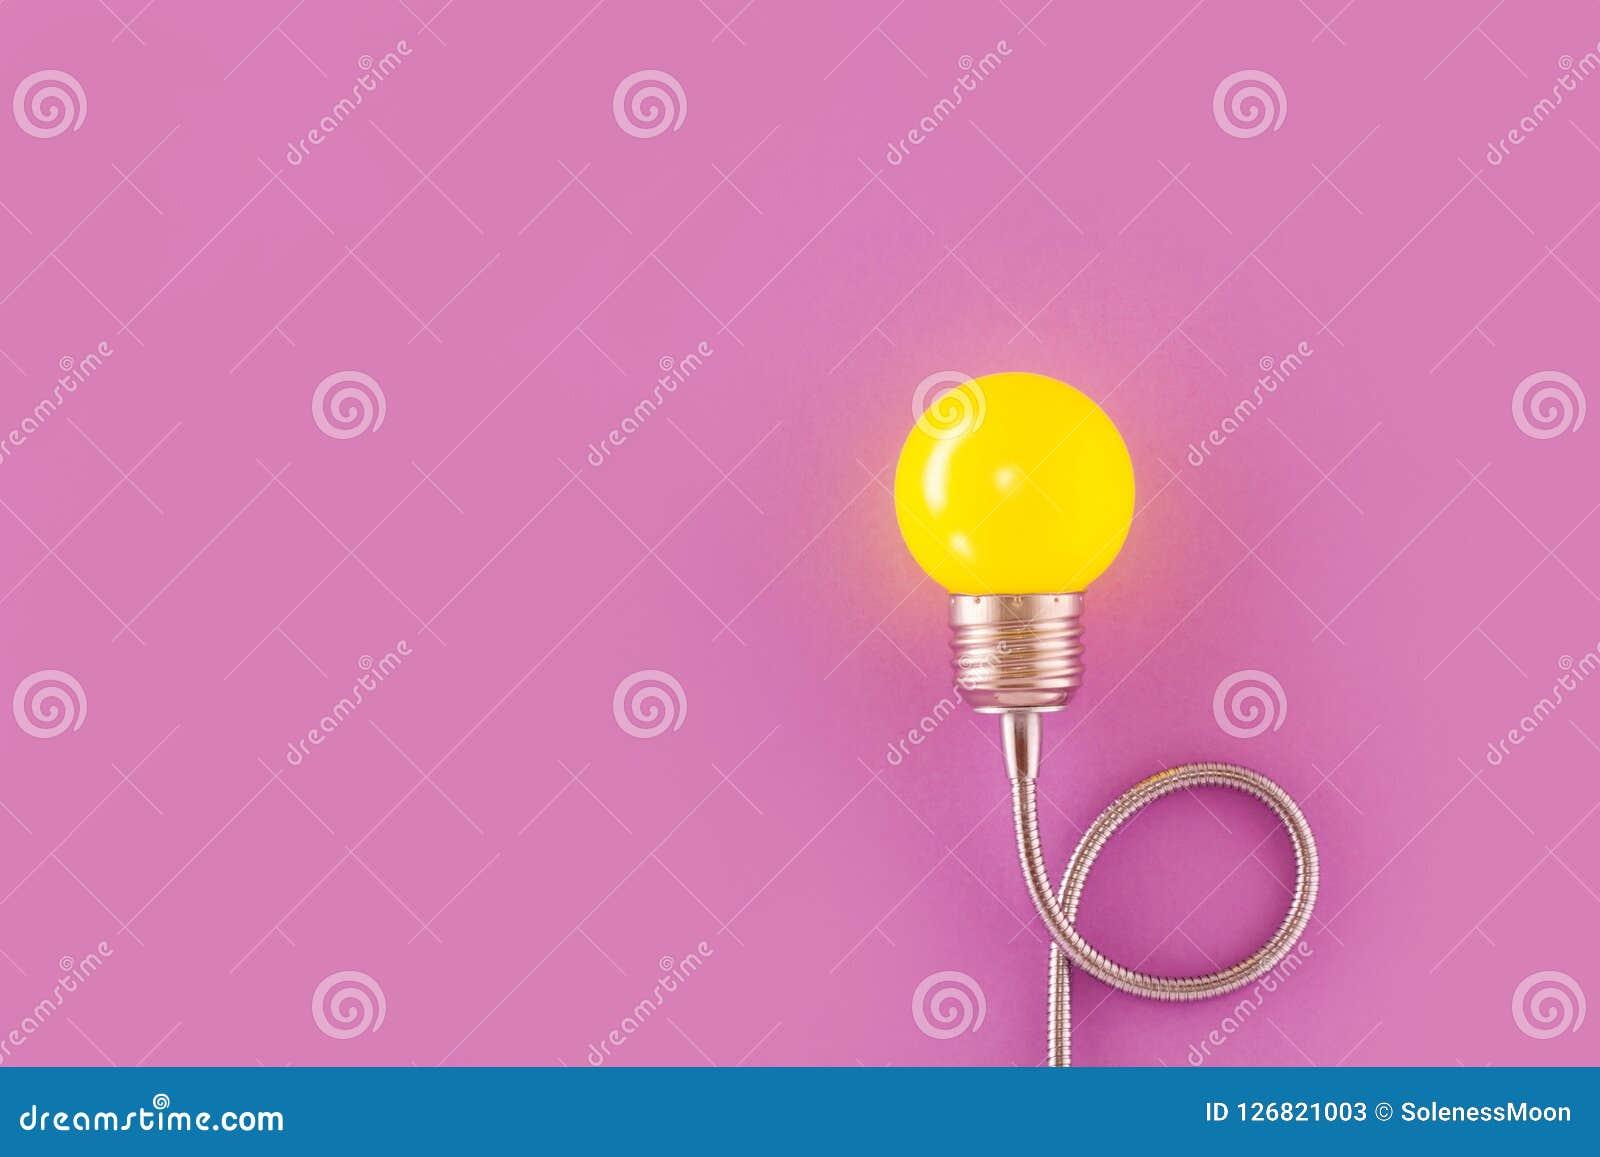 Één gele decoratieve lamp op een lichte violette achtergrond